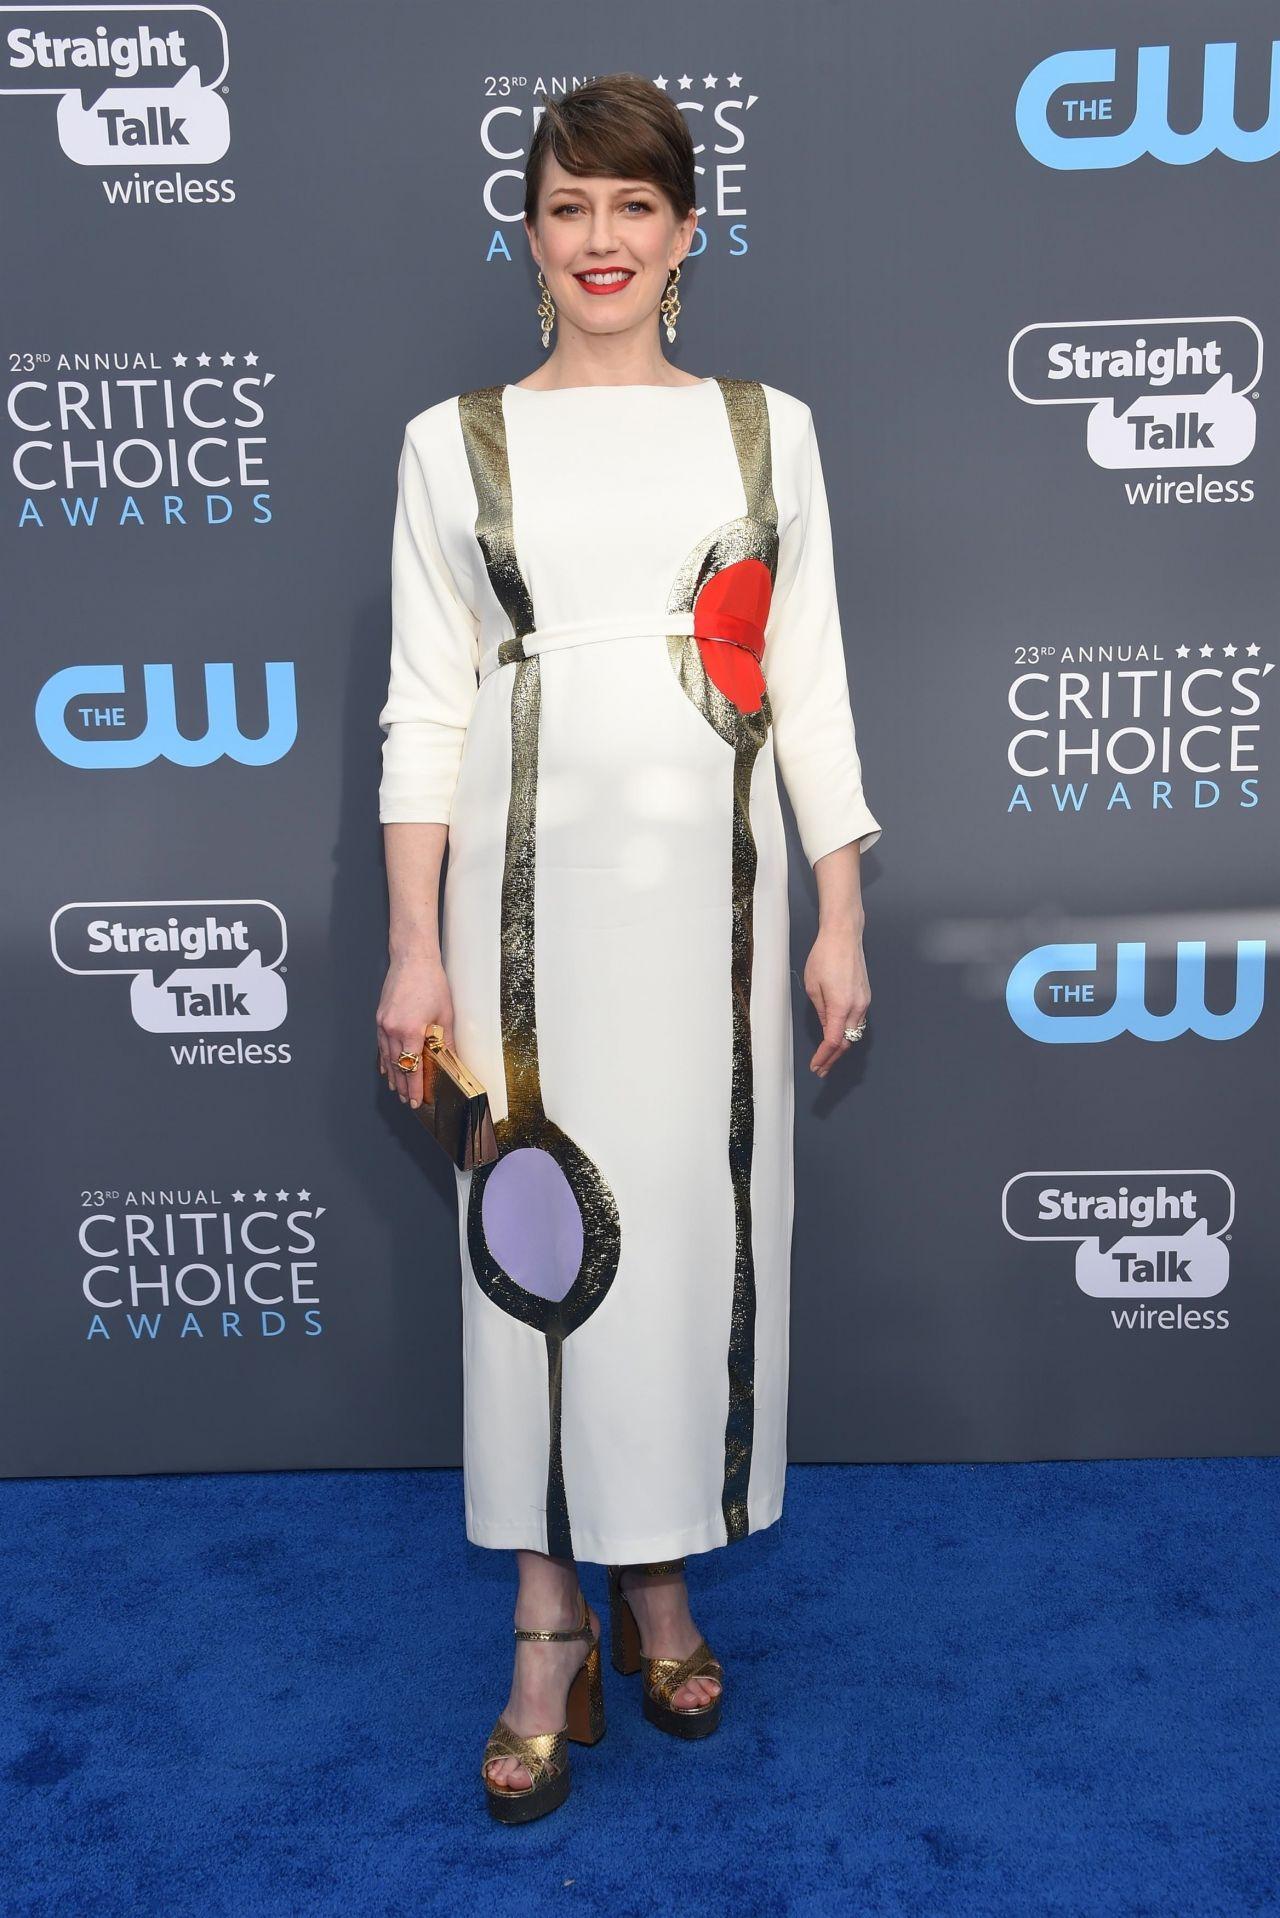 critics choice awards - photo #16